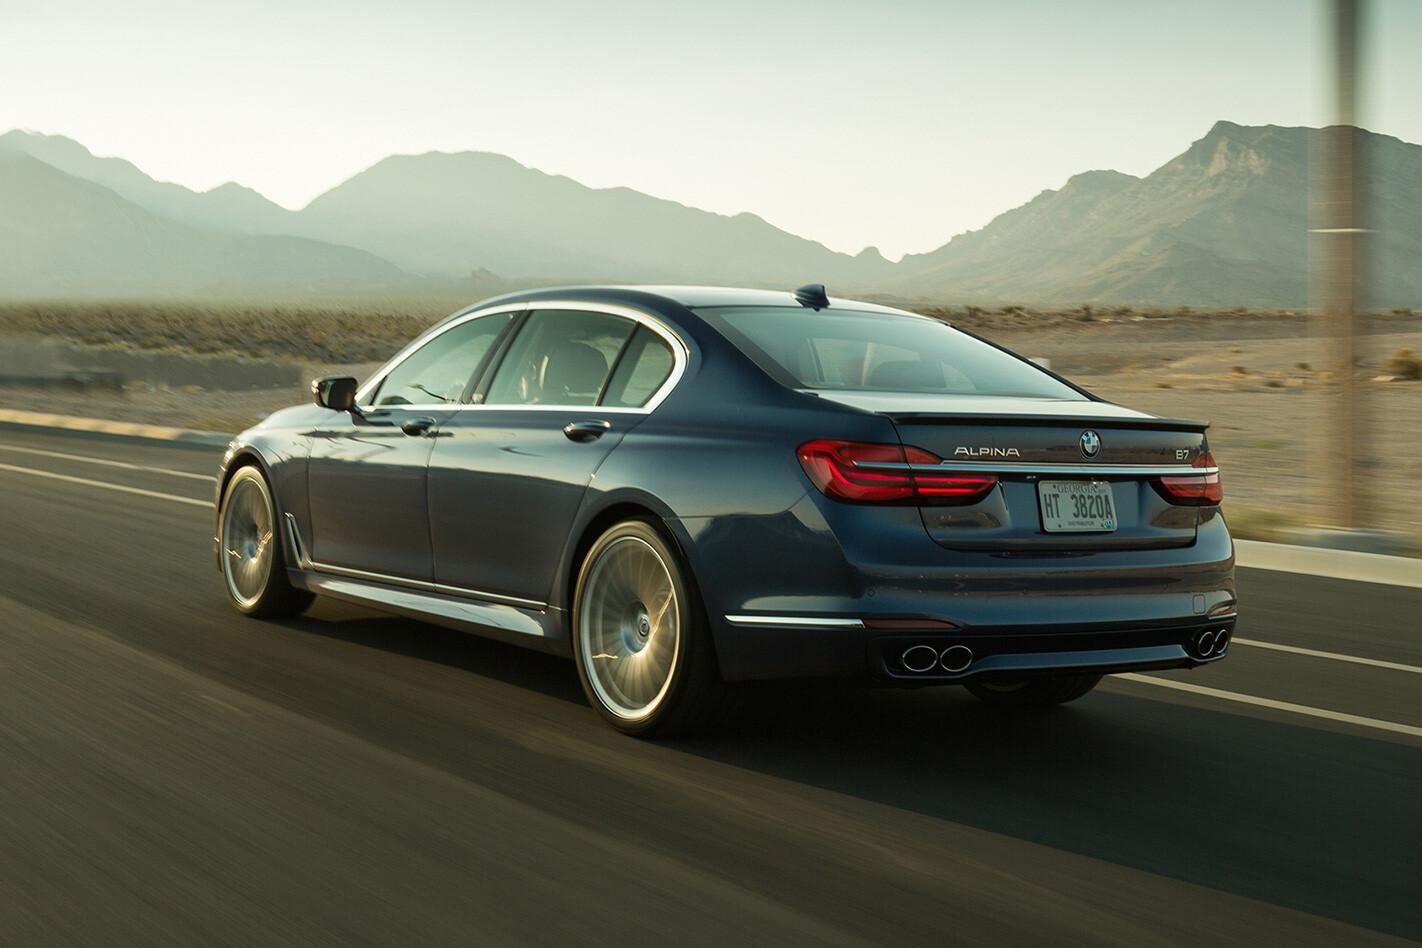 BMW-Alpina-B7-rear.jpg